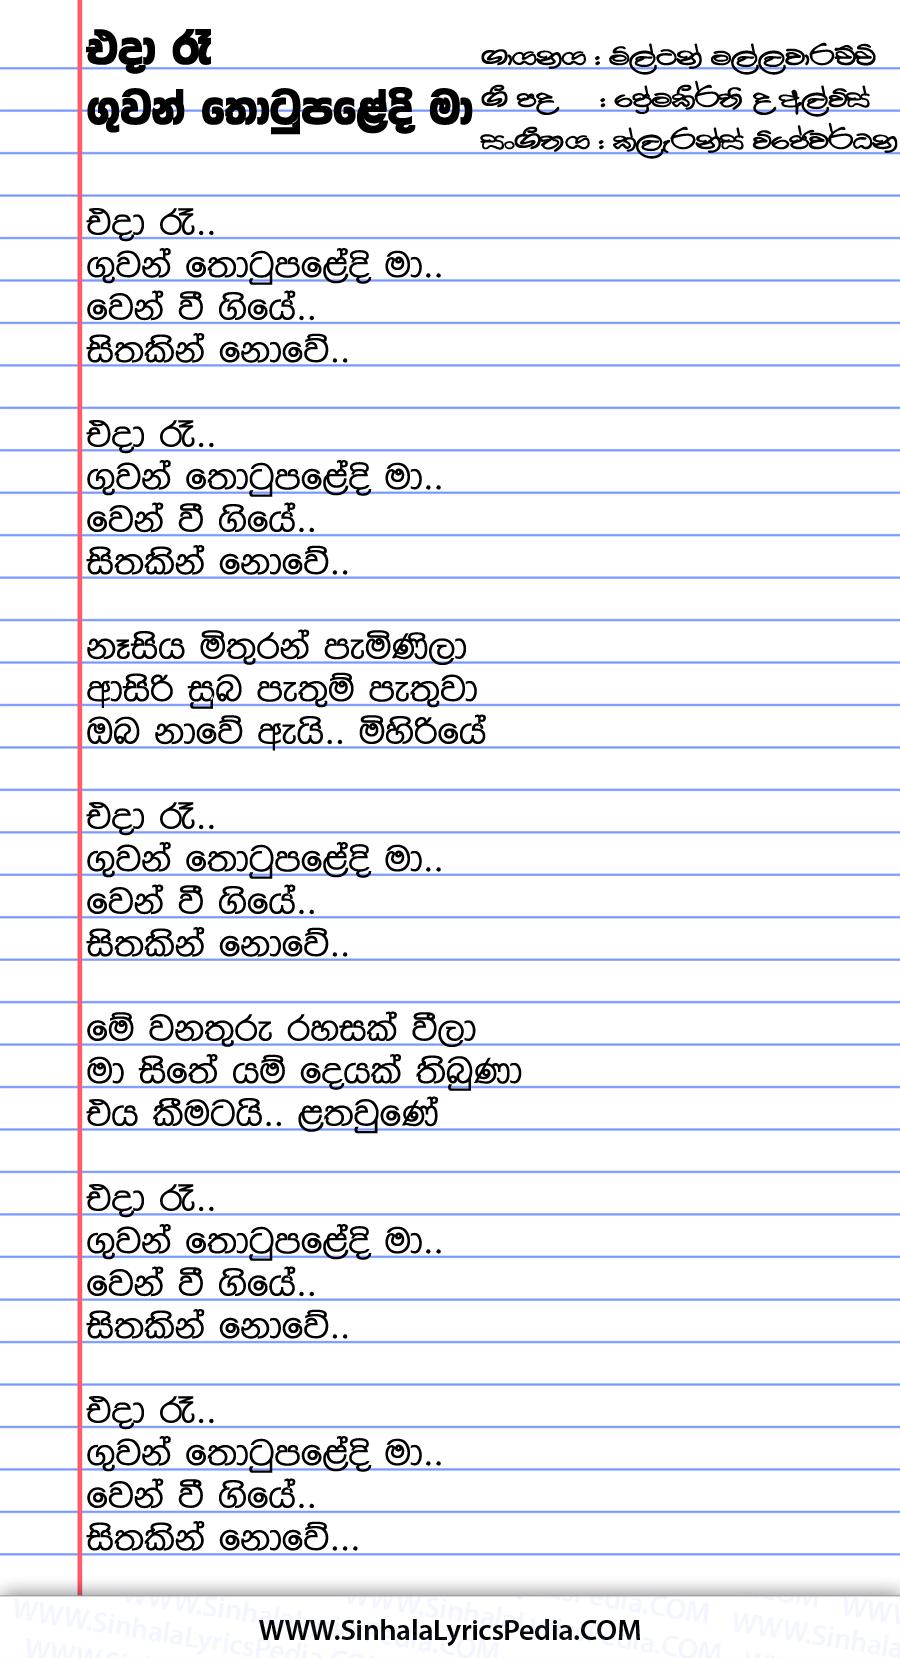 Eda Re Guwan Thotupaledi Ma Song Lyrics